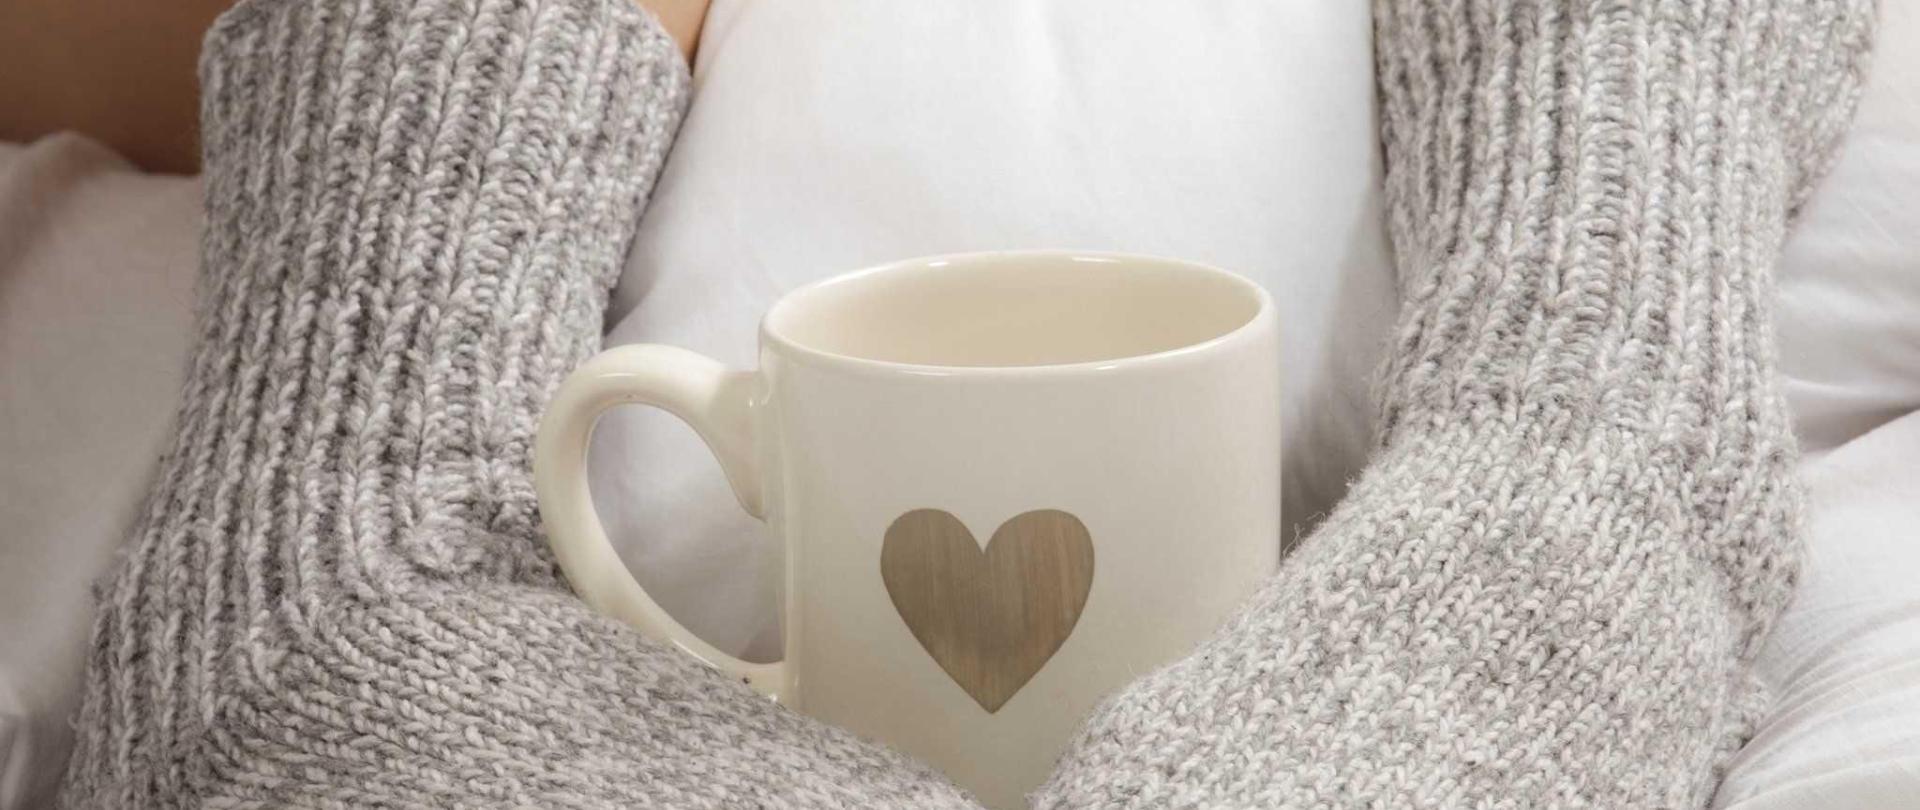 coffee-in-the-morning.jpg